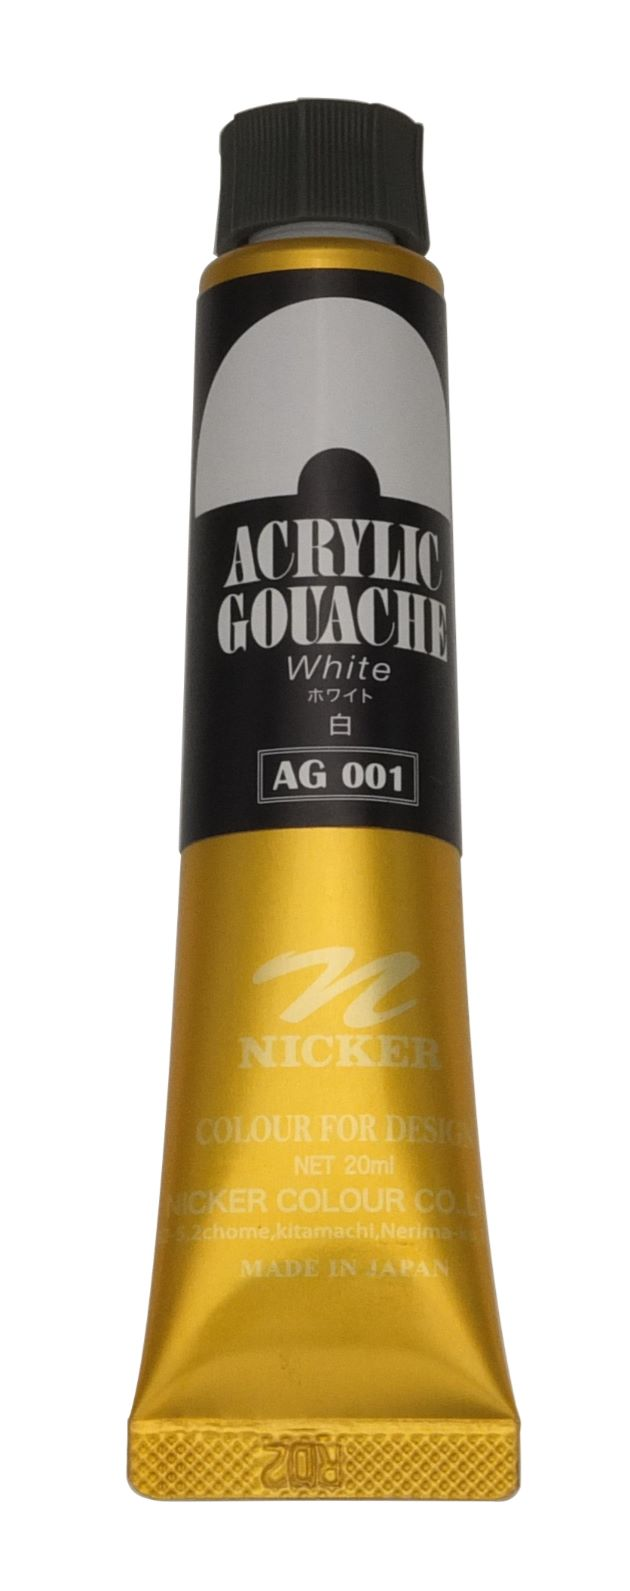 ACRYLIC GOUACHE 20ml AG001 WHITE